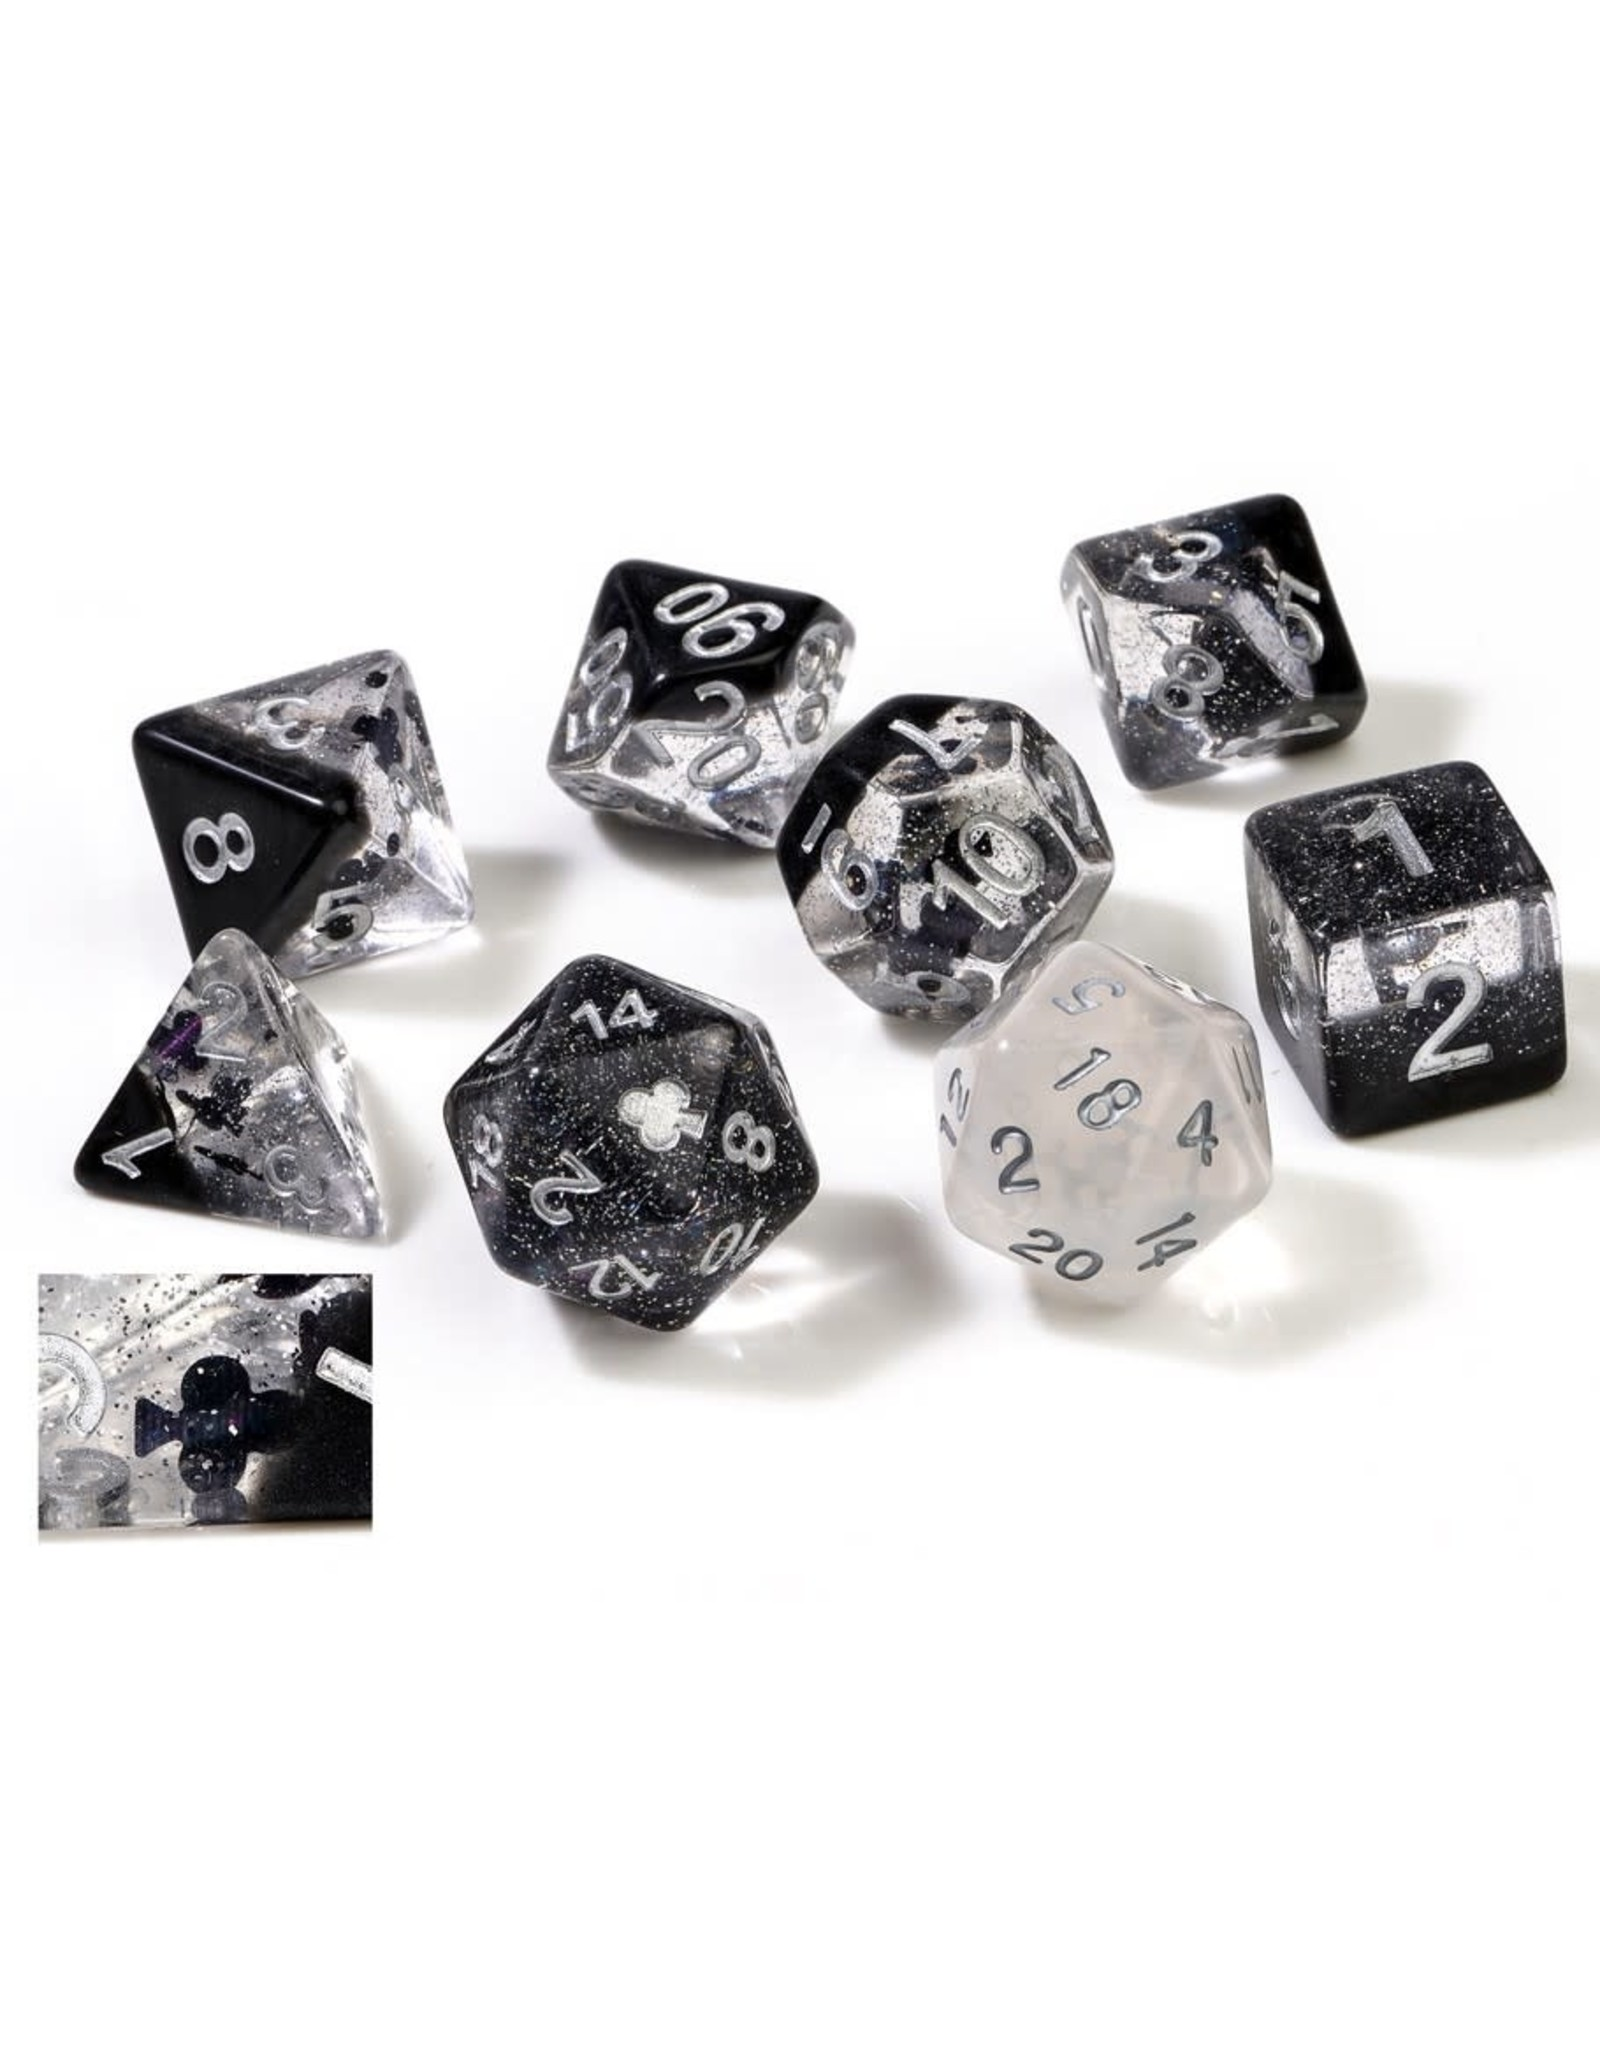 Sirius Dice RPG Dice (7) Set Spades